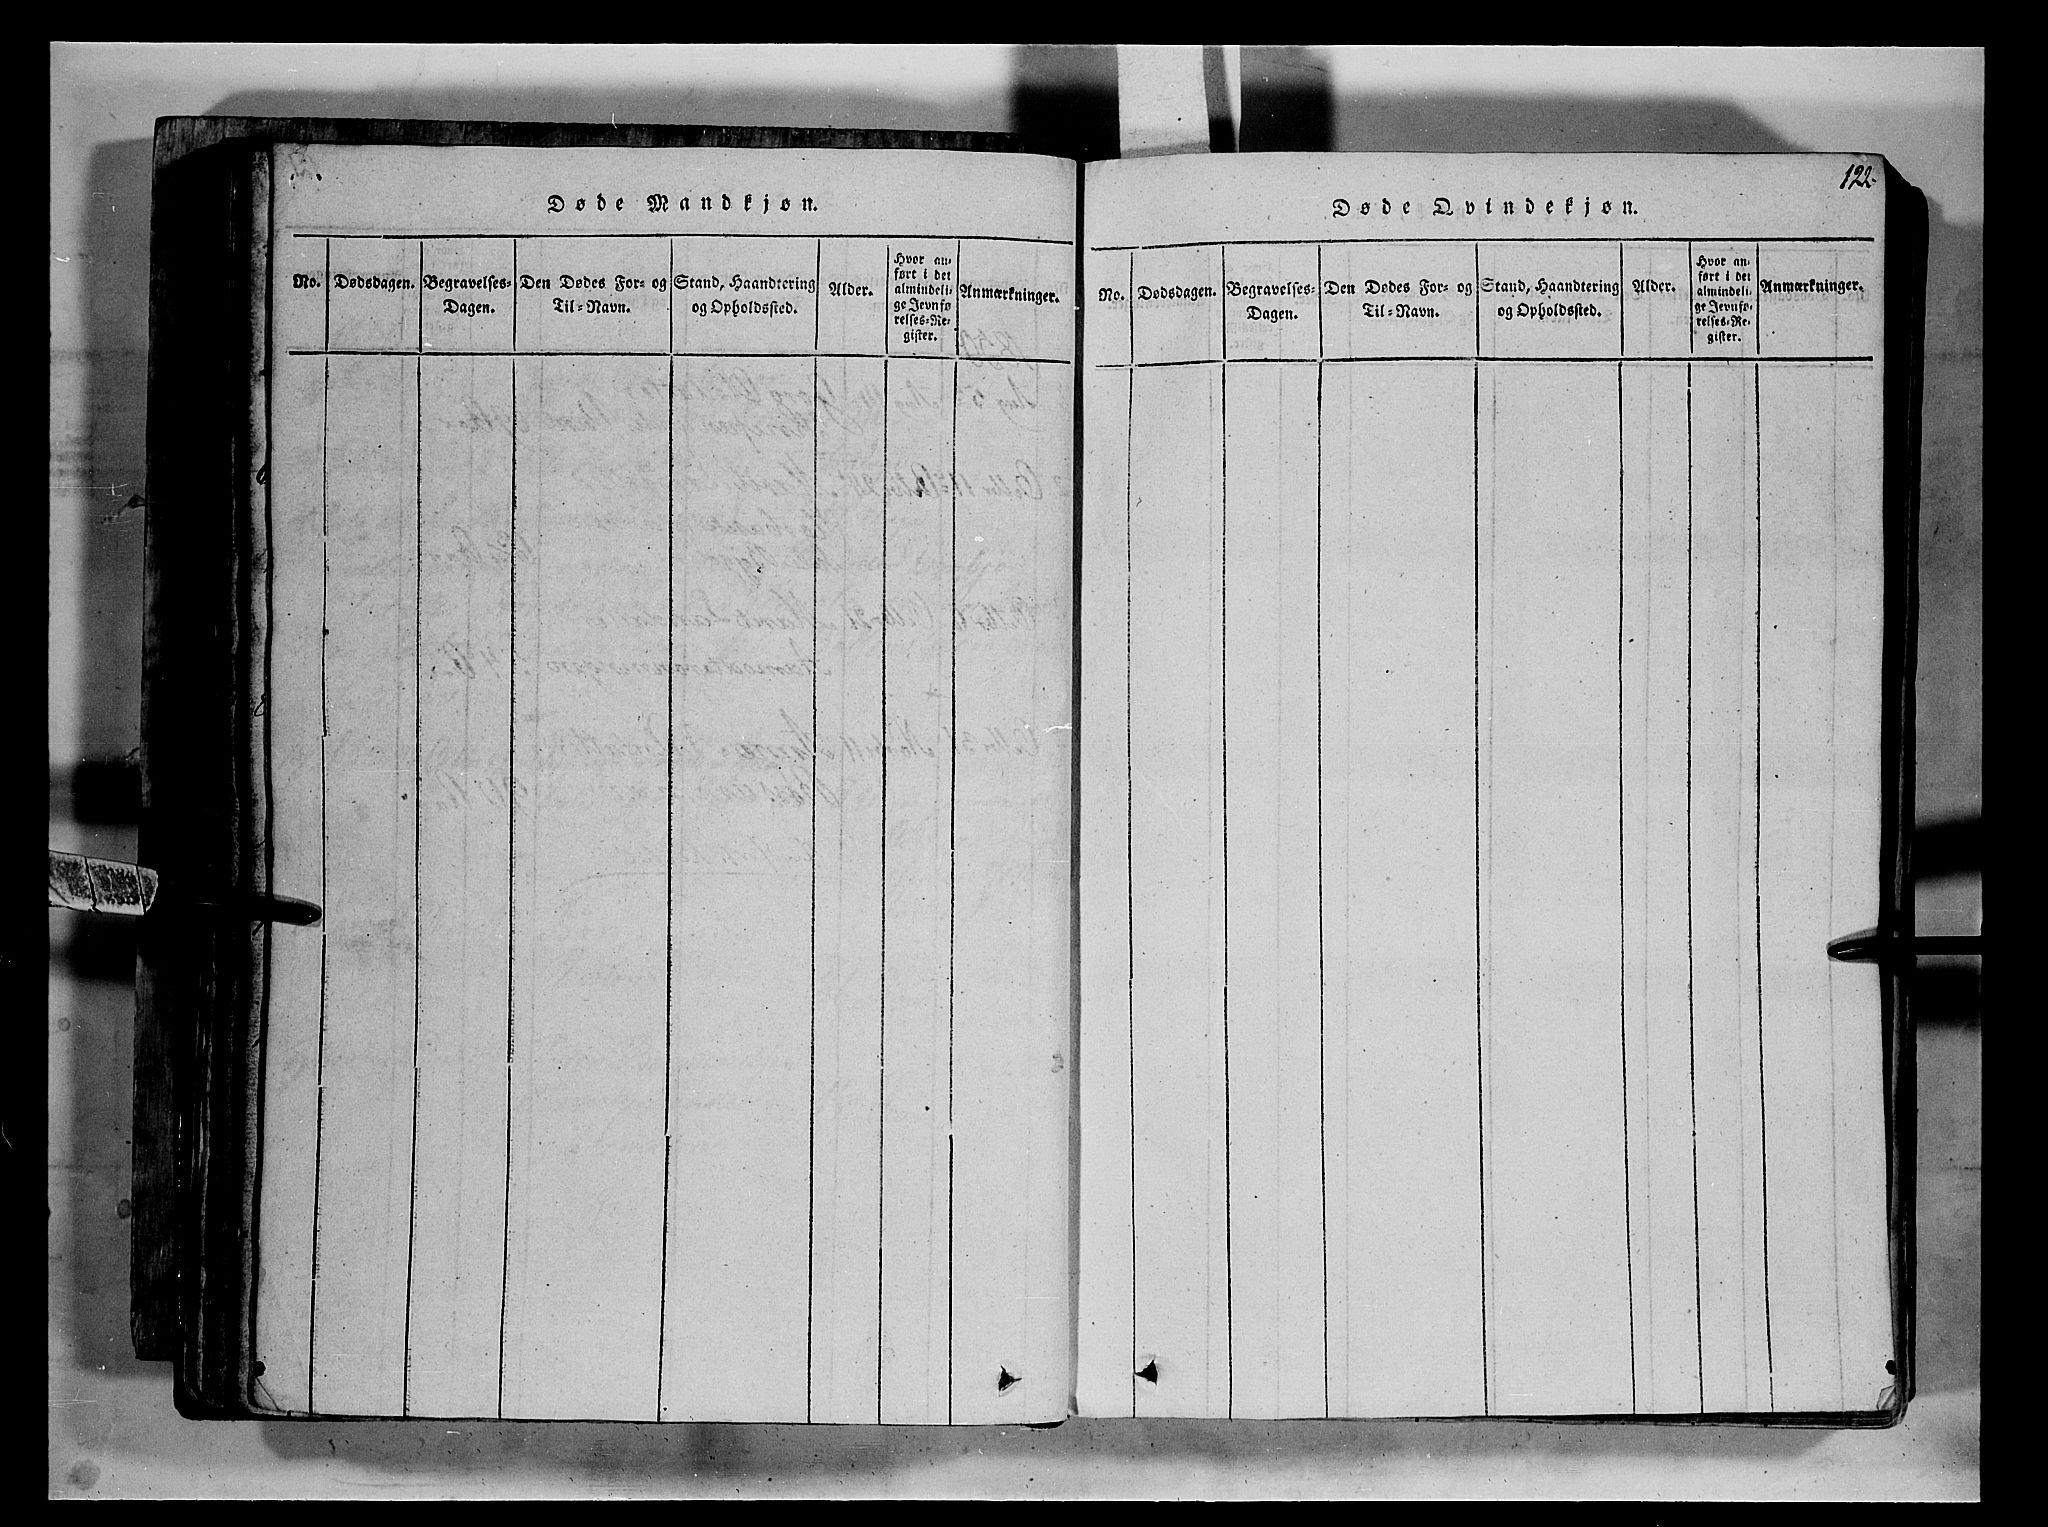 SAH, Fron prestekontor, H/Ha/Hab/L0002: Klokkerbok nr. 2, 1816-1850, s. 122